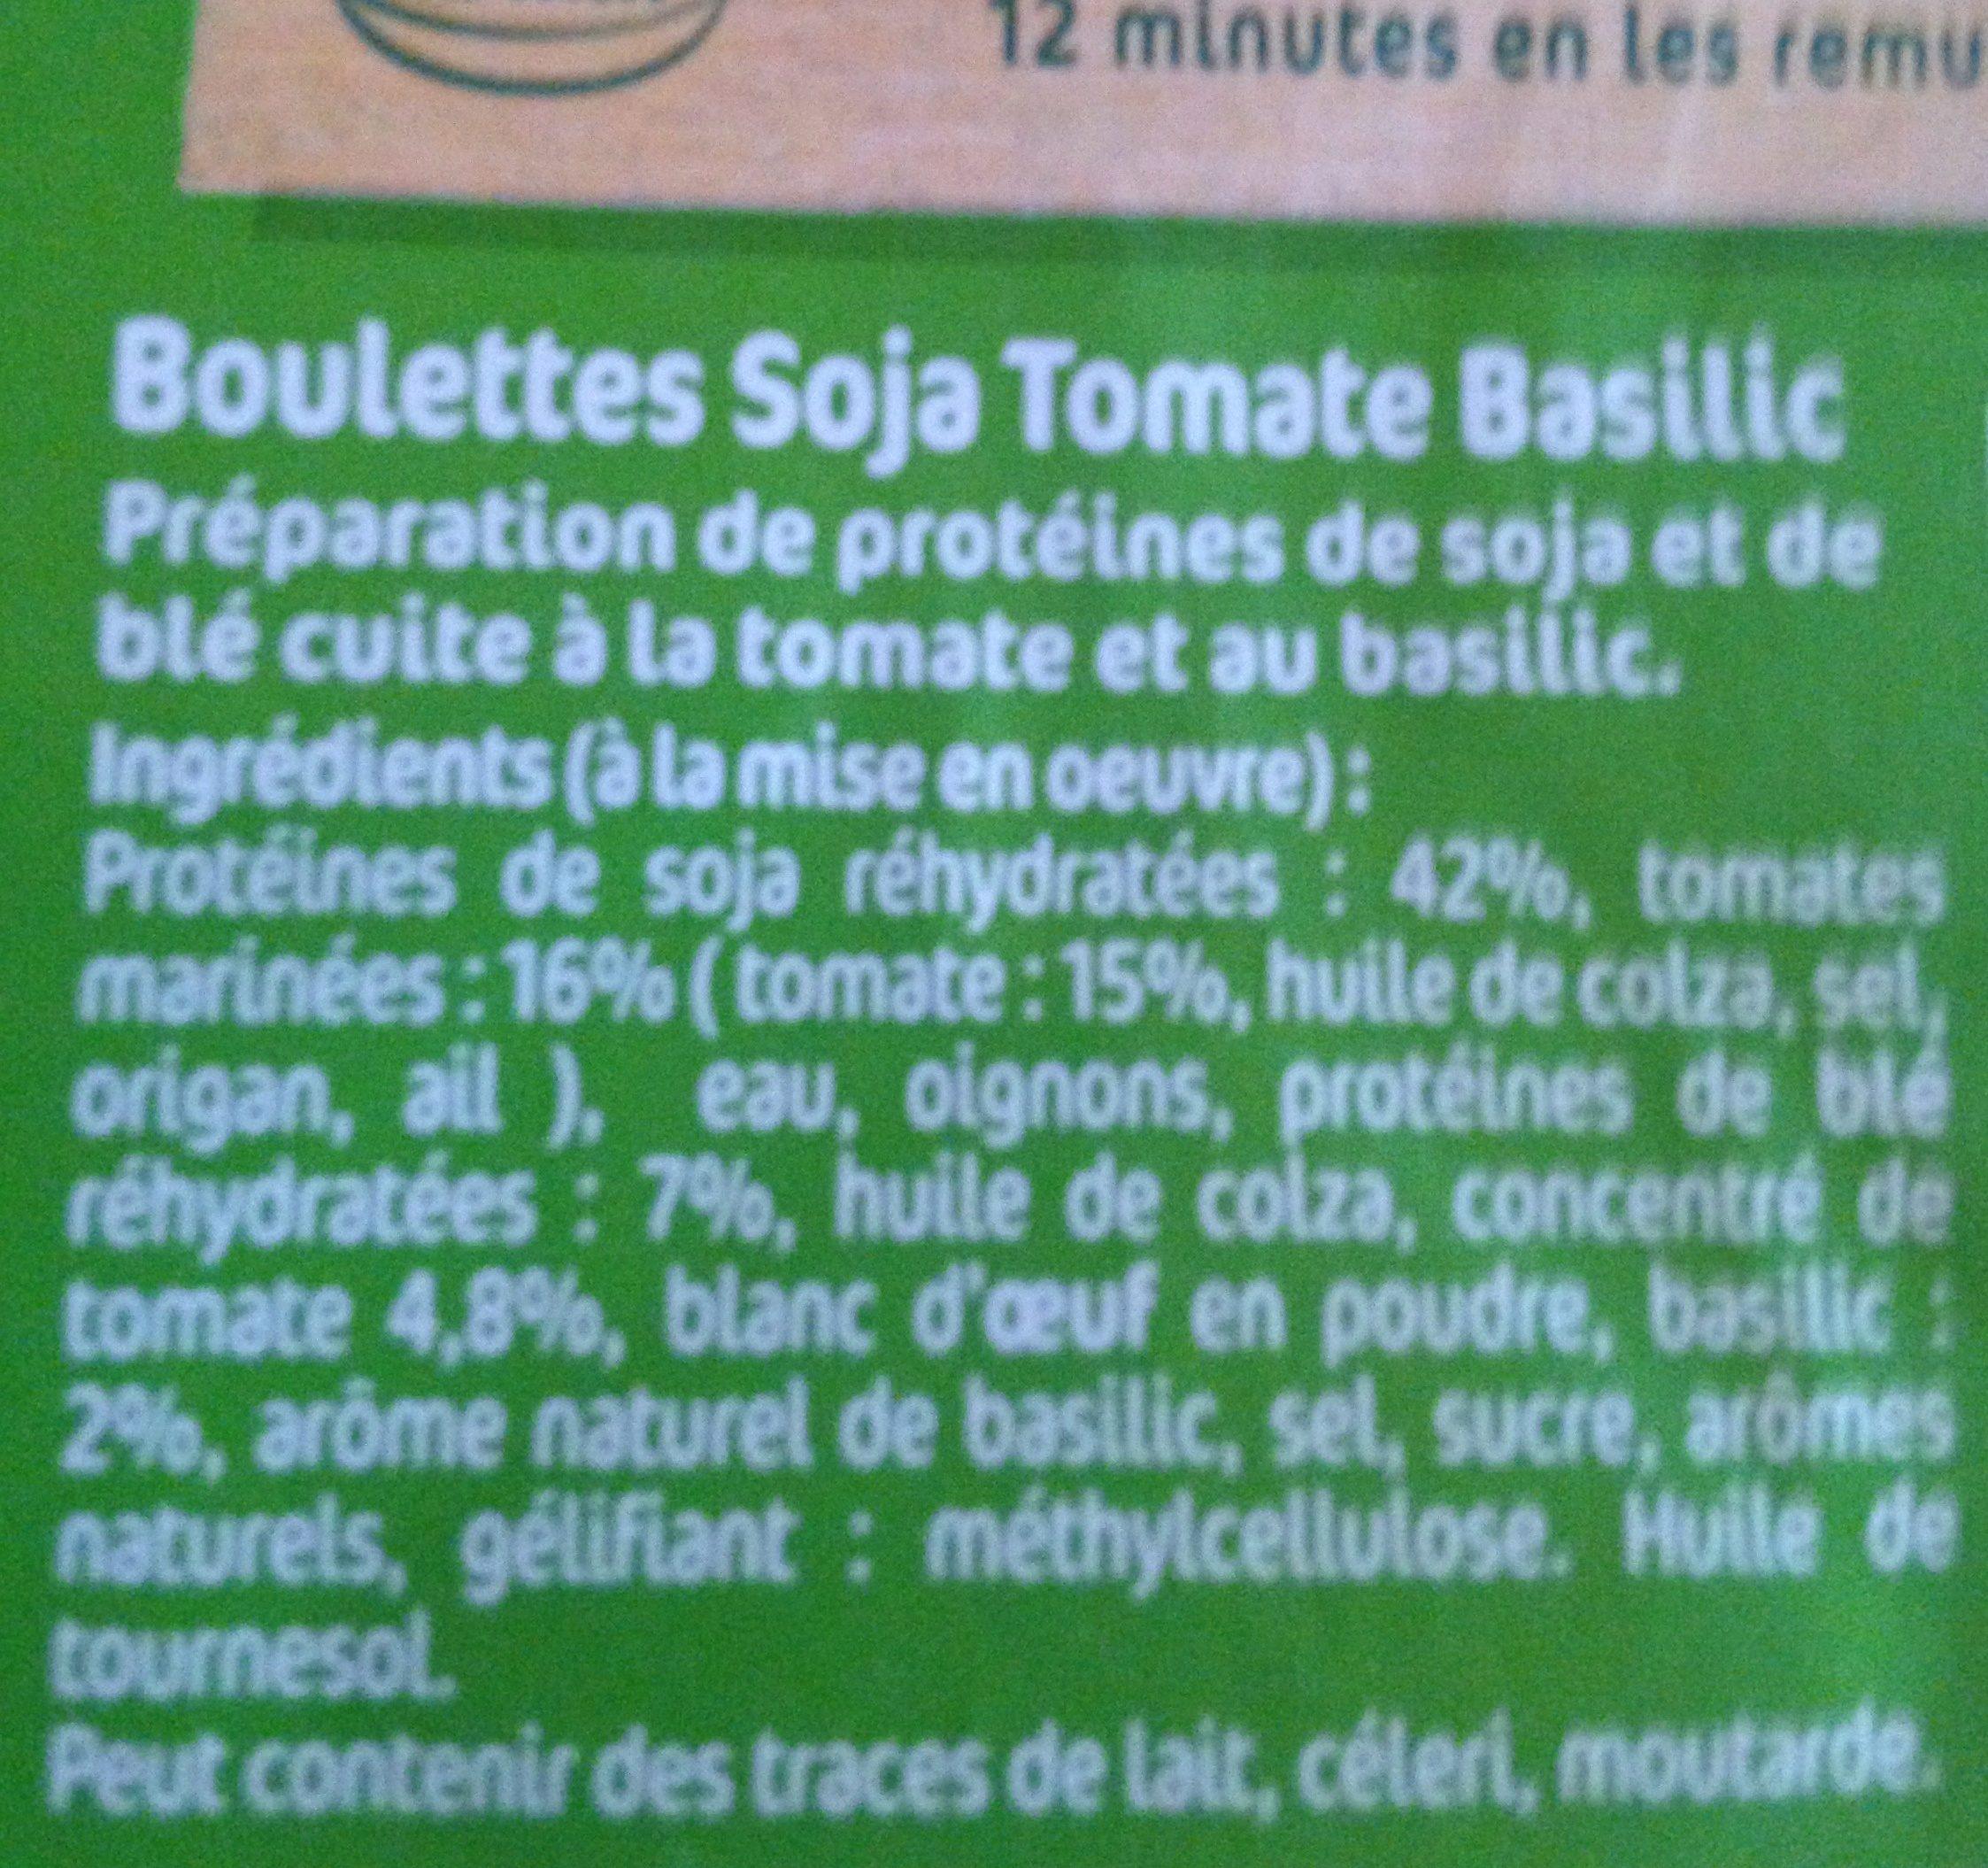 Boulettes Soja Tomates Basilic - Ingredients - fr